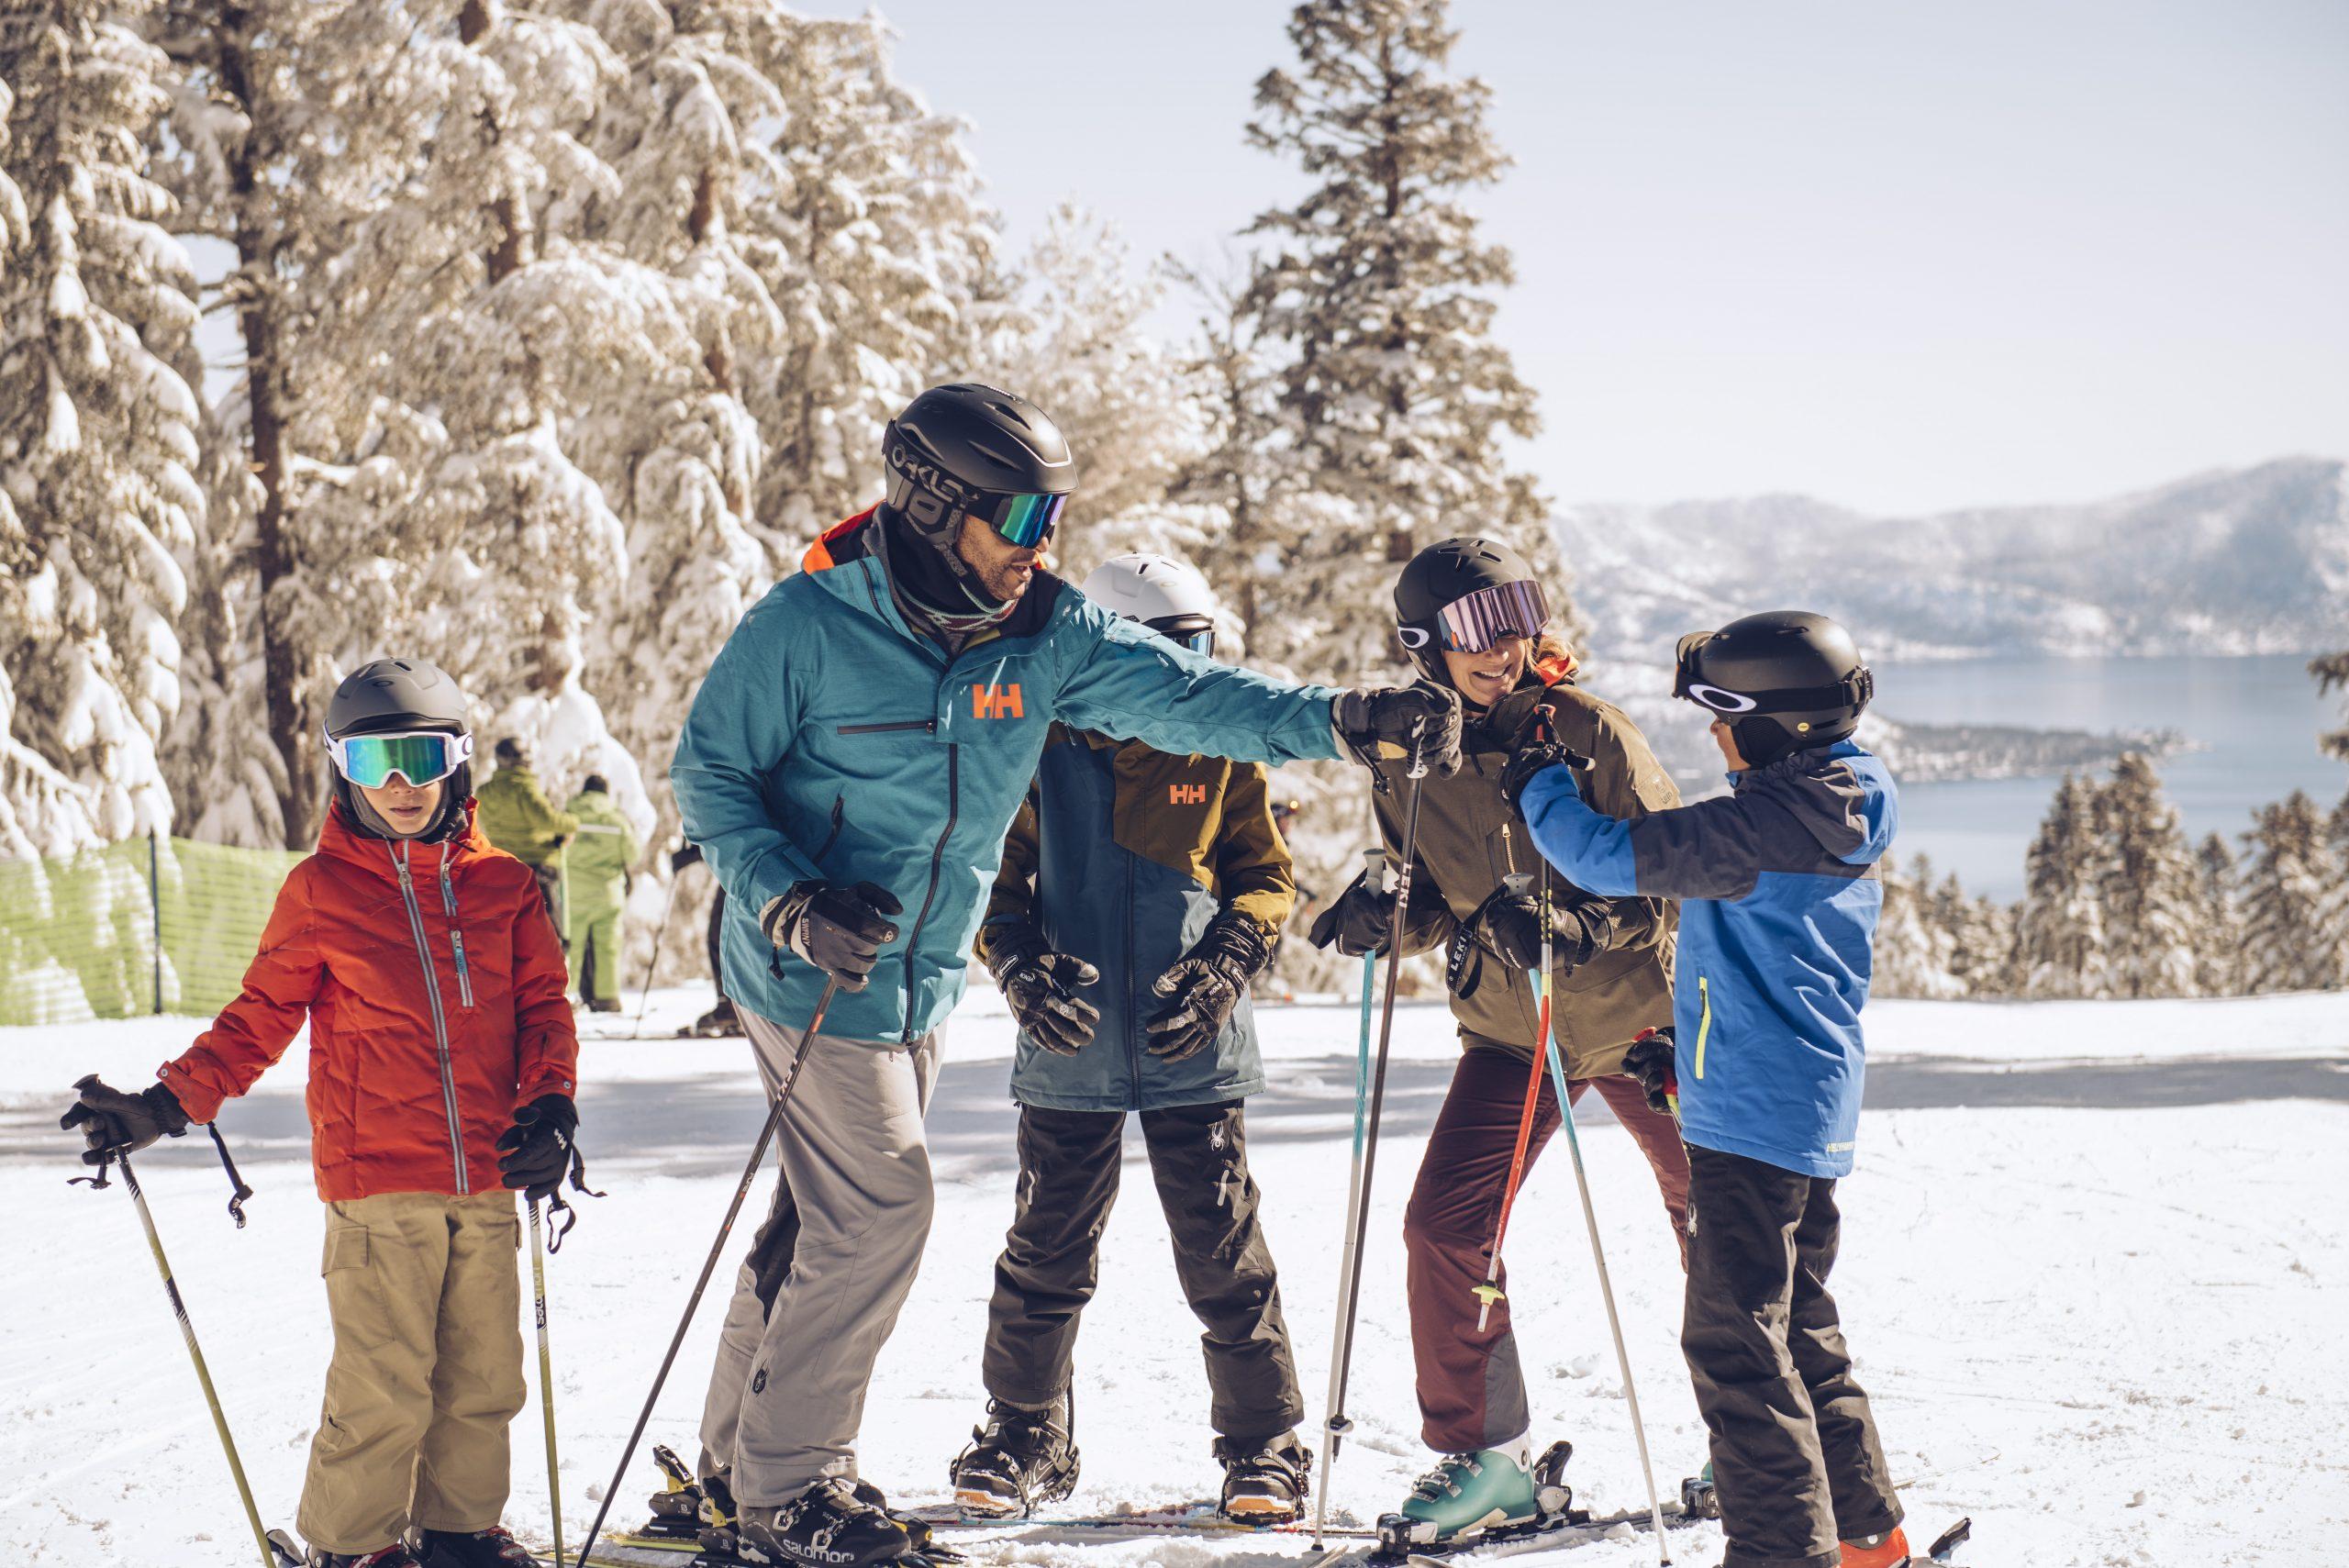 Mountain Holiday Traditions – Skiing on Christmas